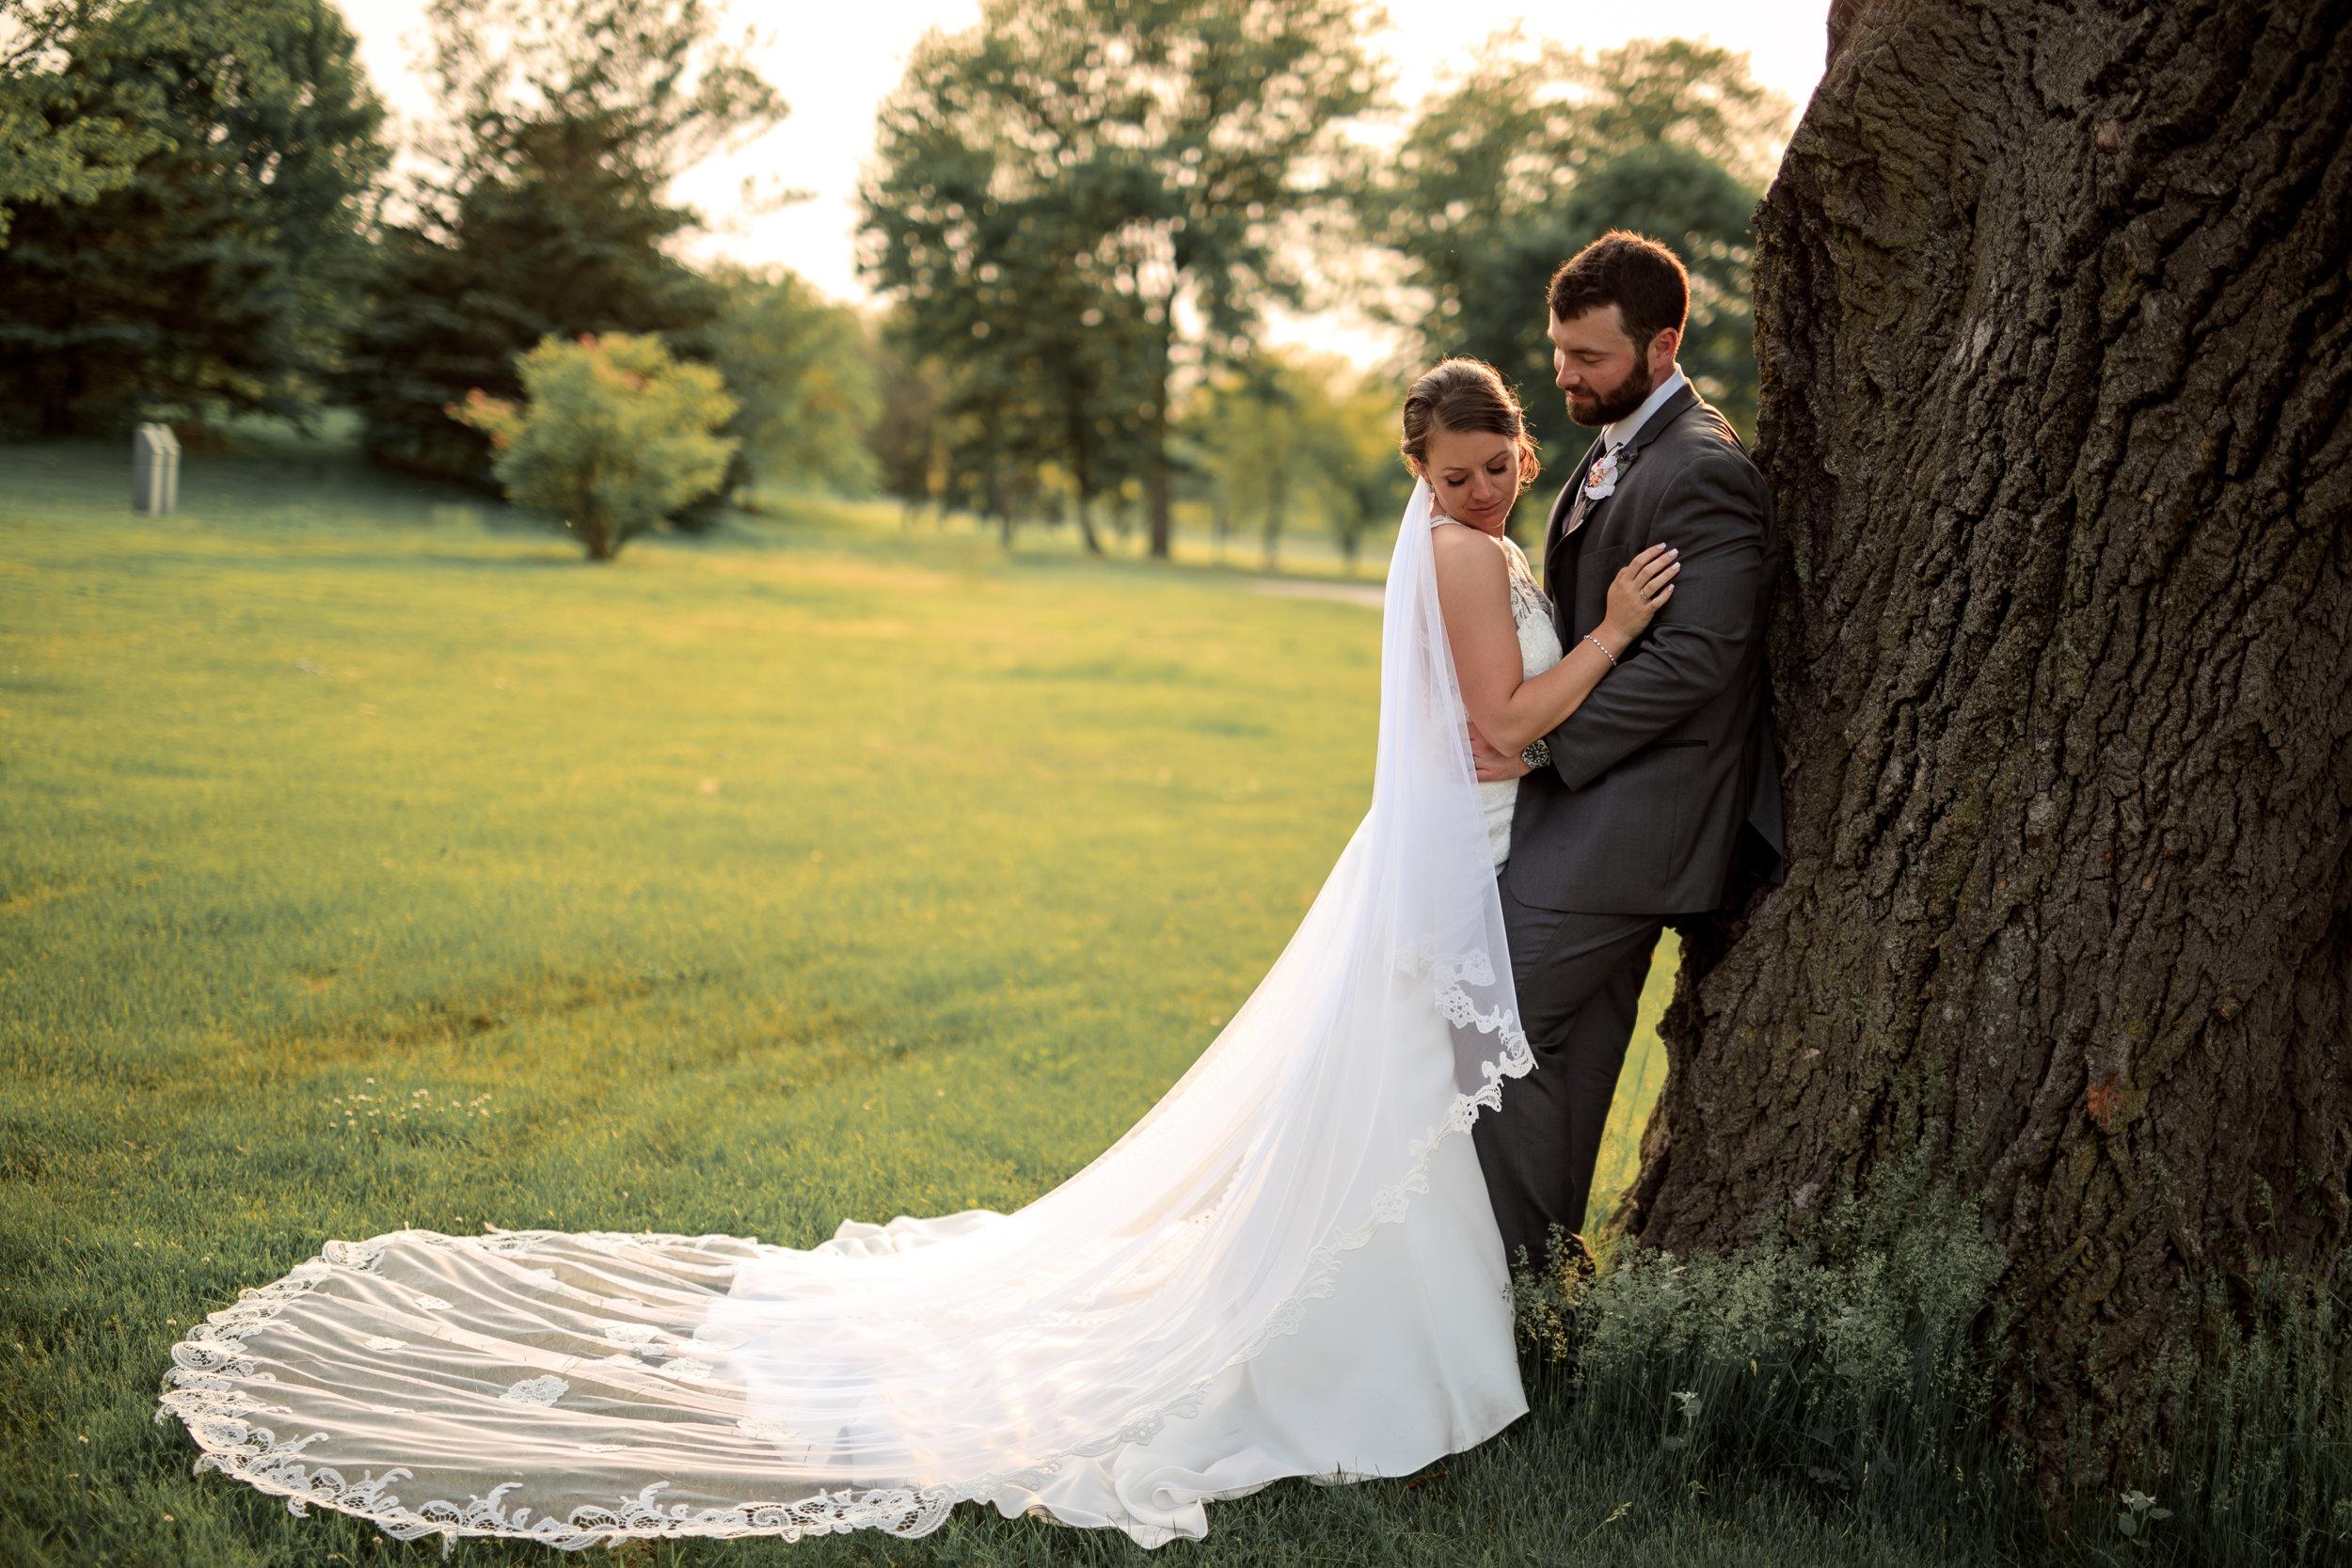 silver-lake-orland-park-wedding65.jpg